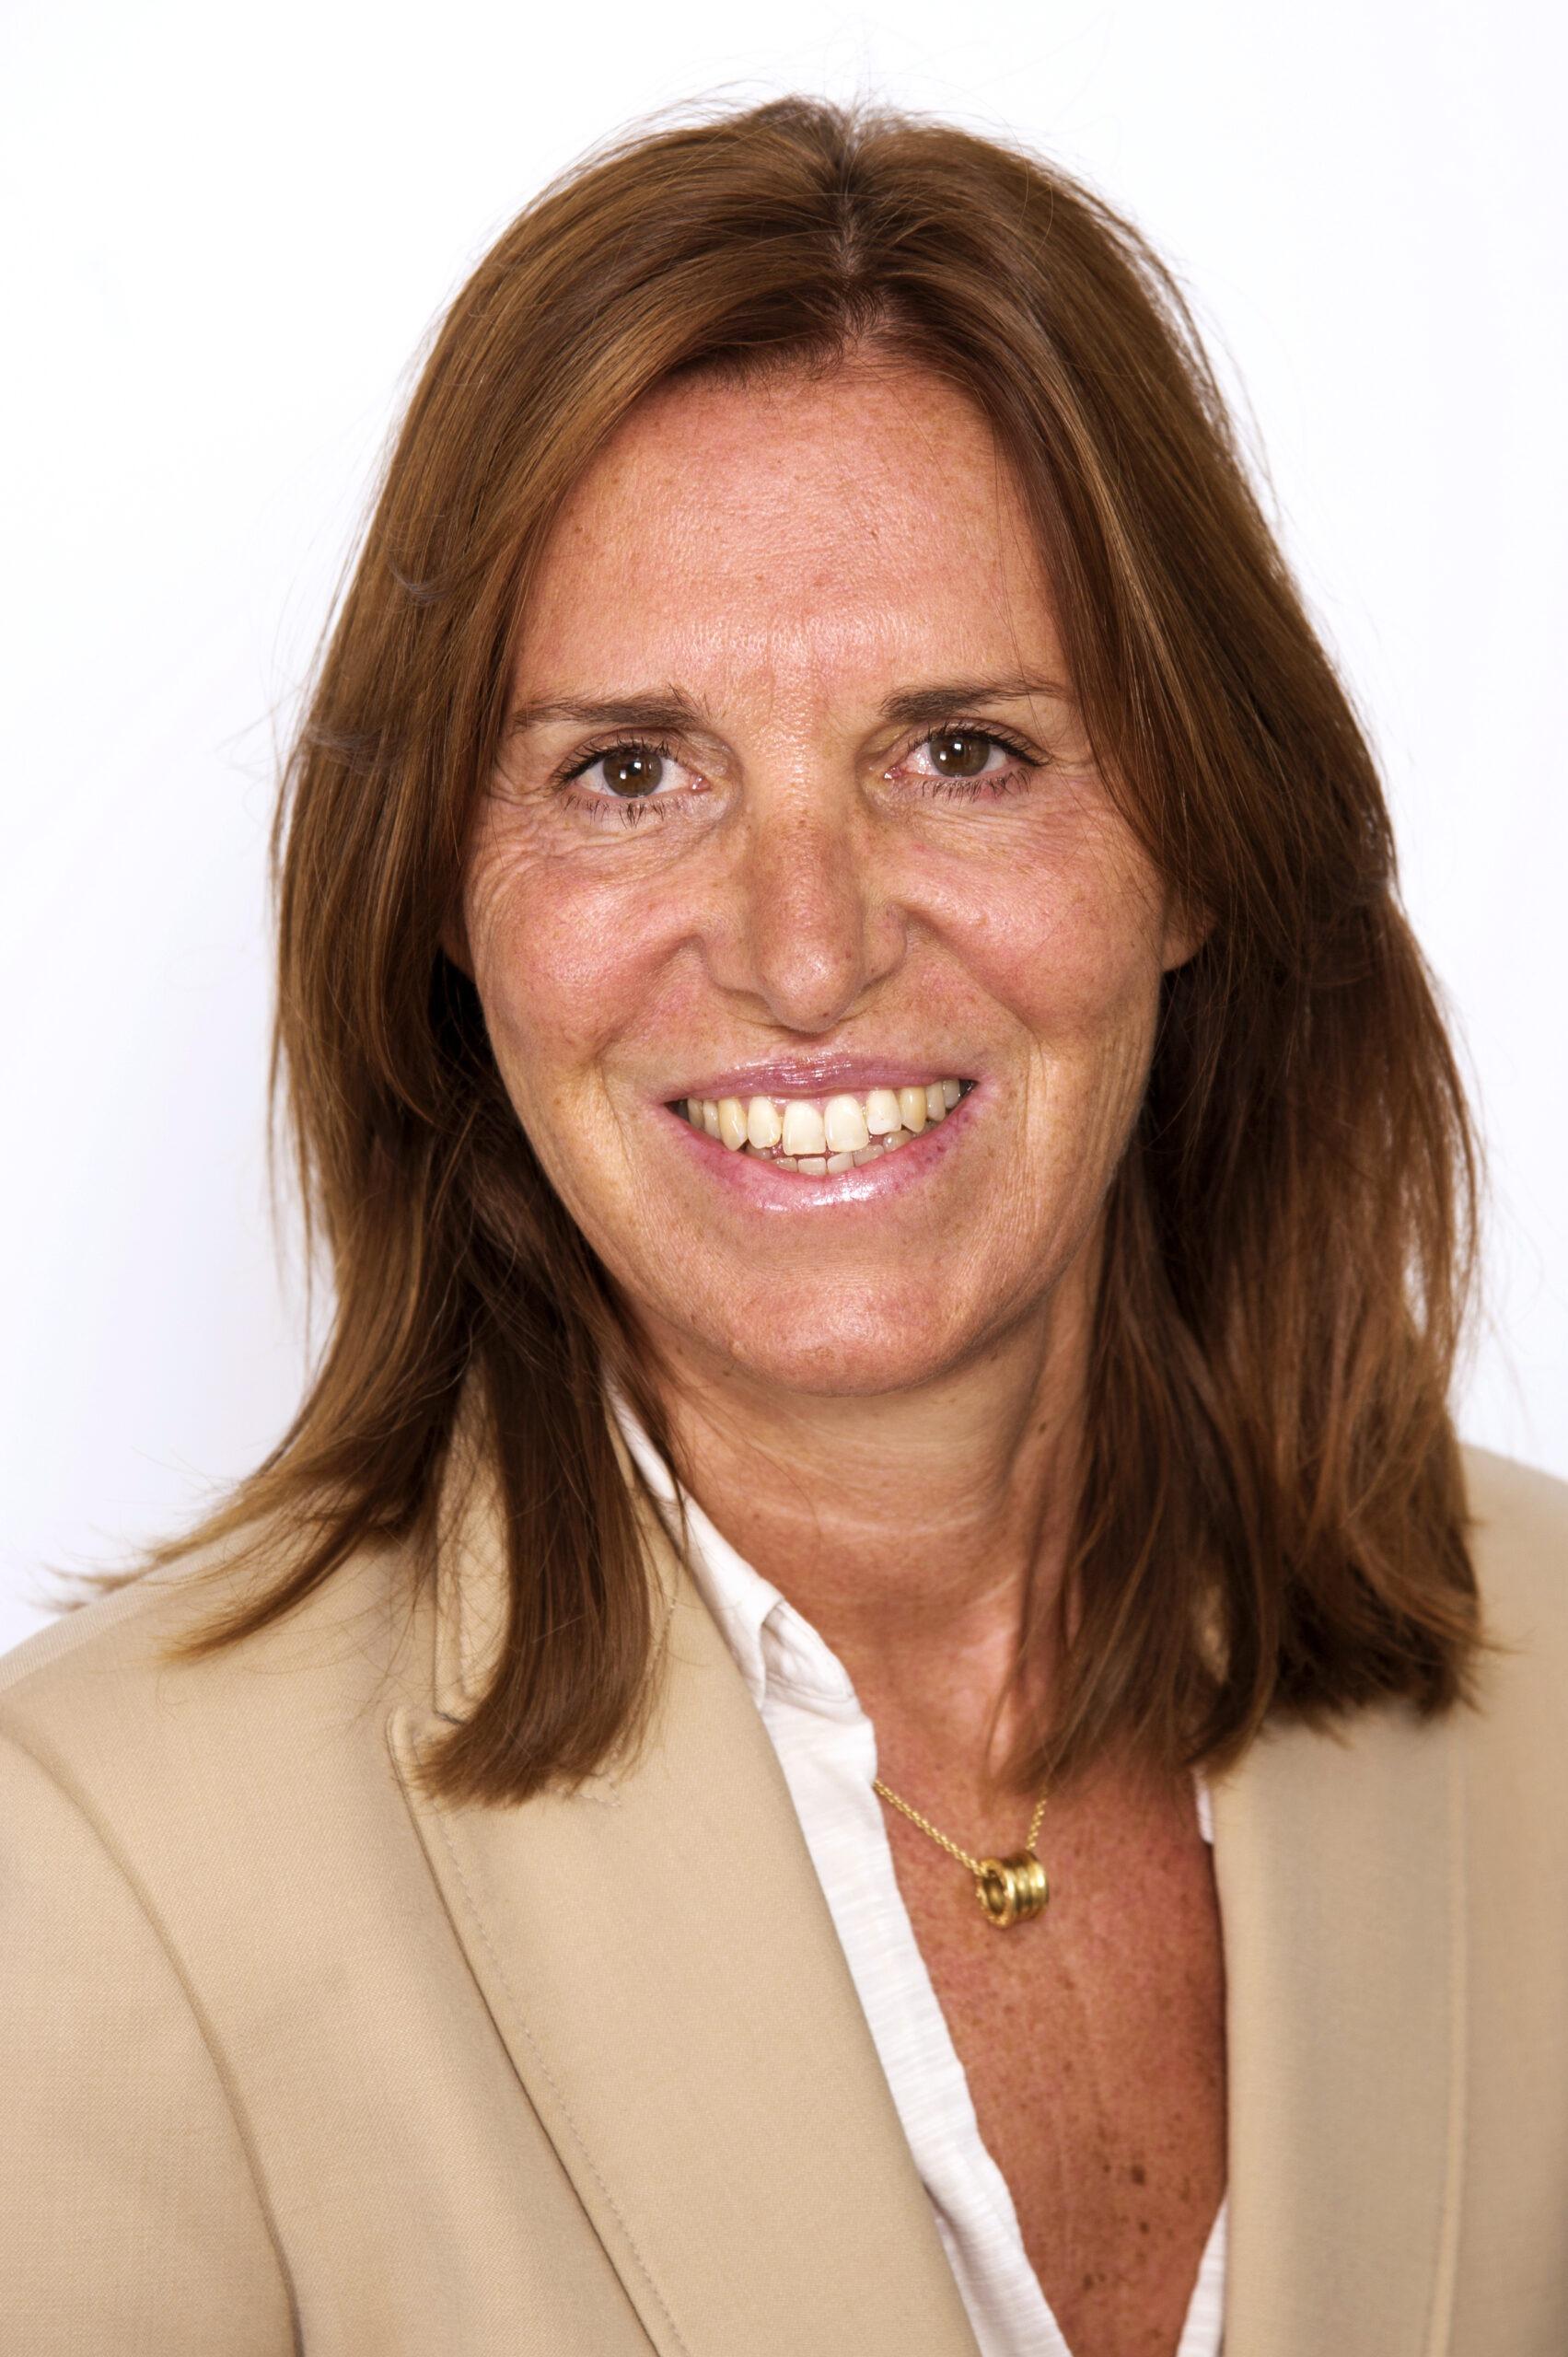 Murielle Weyers